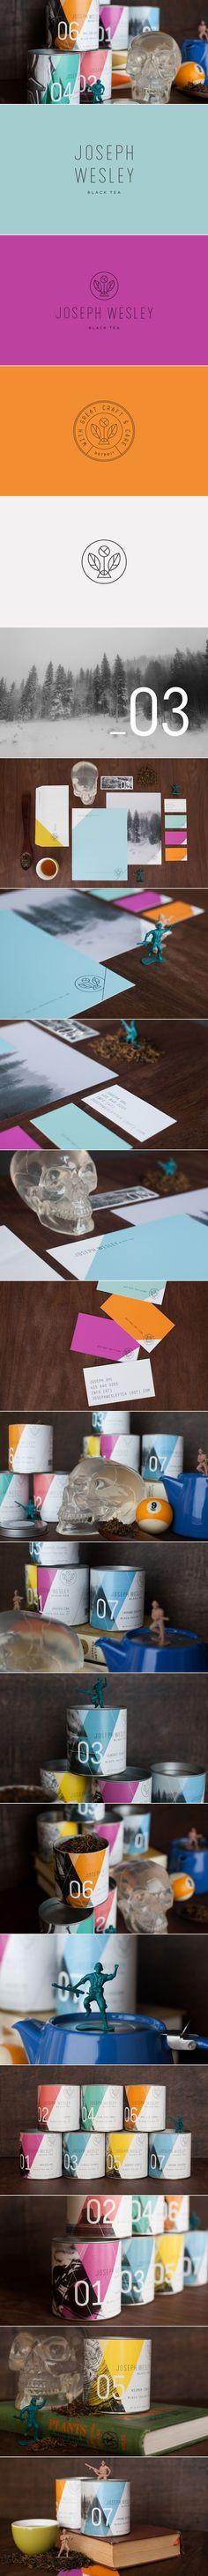 Joseph Wesley Black Tea — The Dieline | Packaging & Branding Design & Innovation News